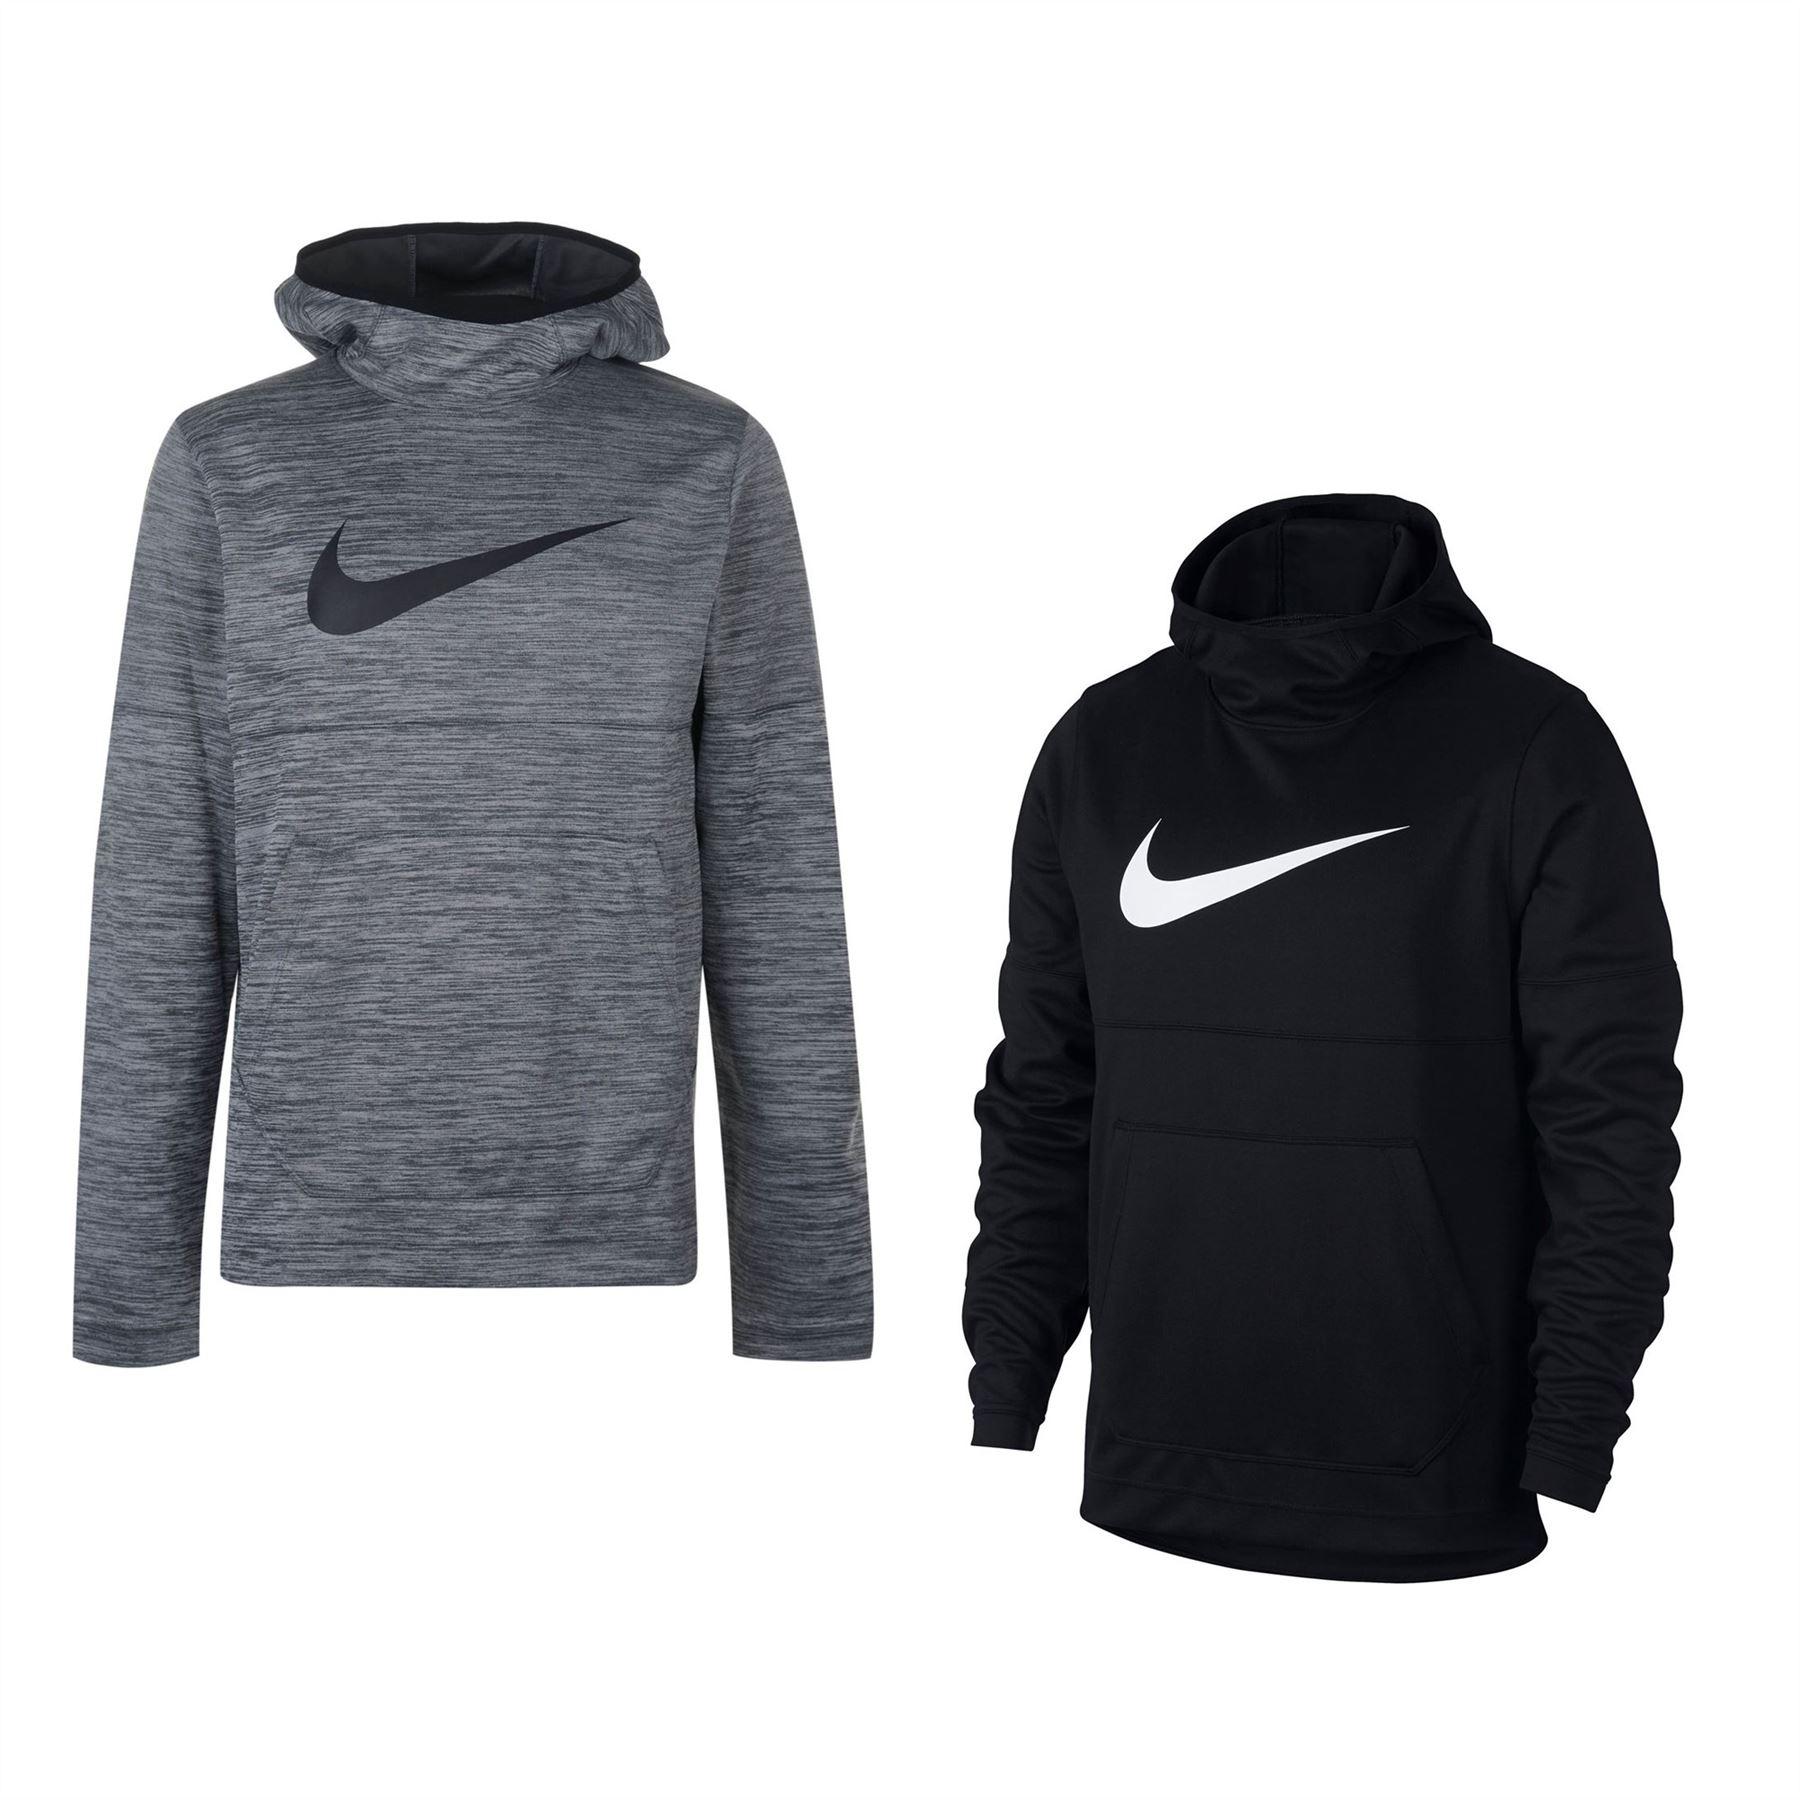 super popular 4f5d0 bb5da Details about Nike Spotlight Pullover Hoody Mens Hoodie Top Sweatshirt  Sweater